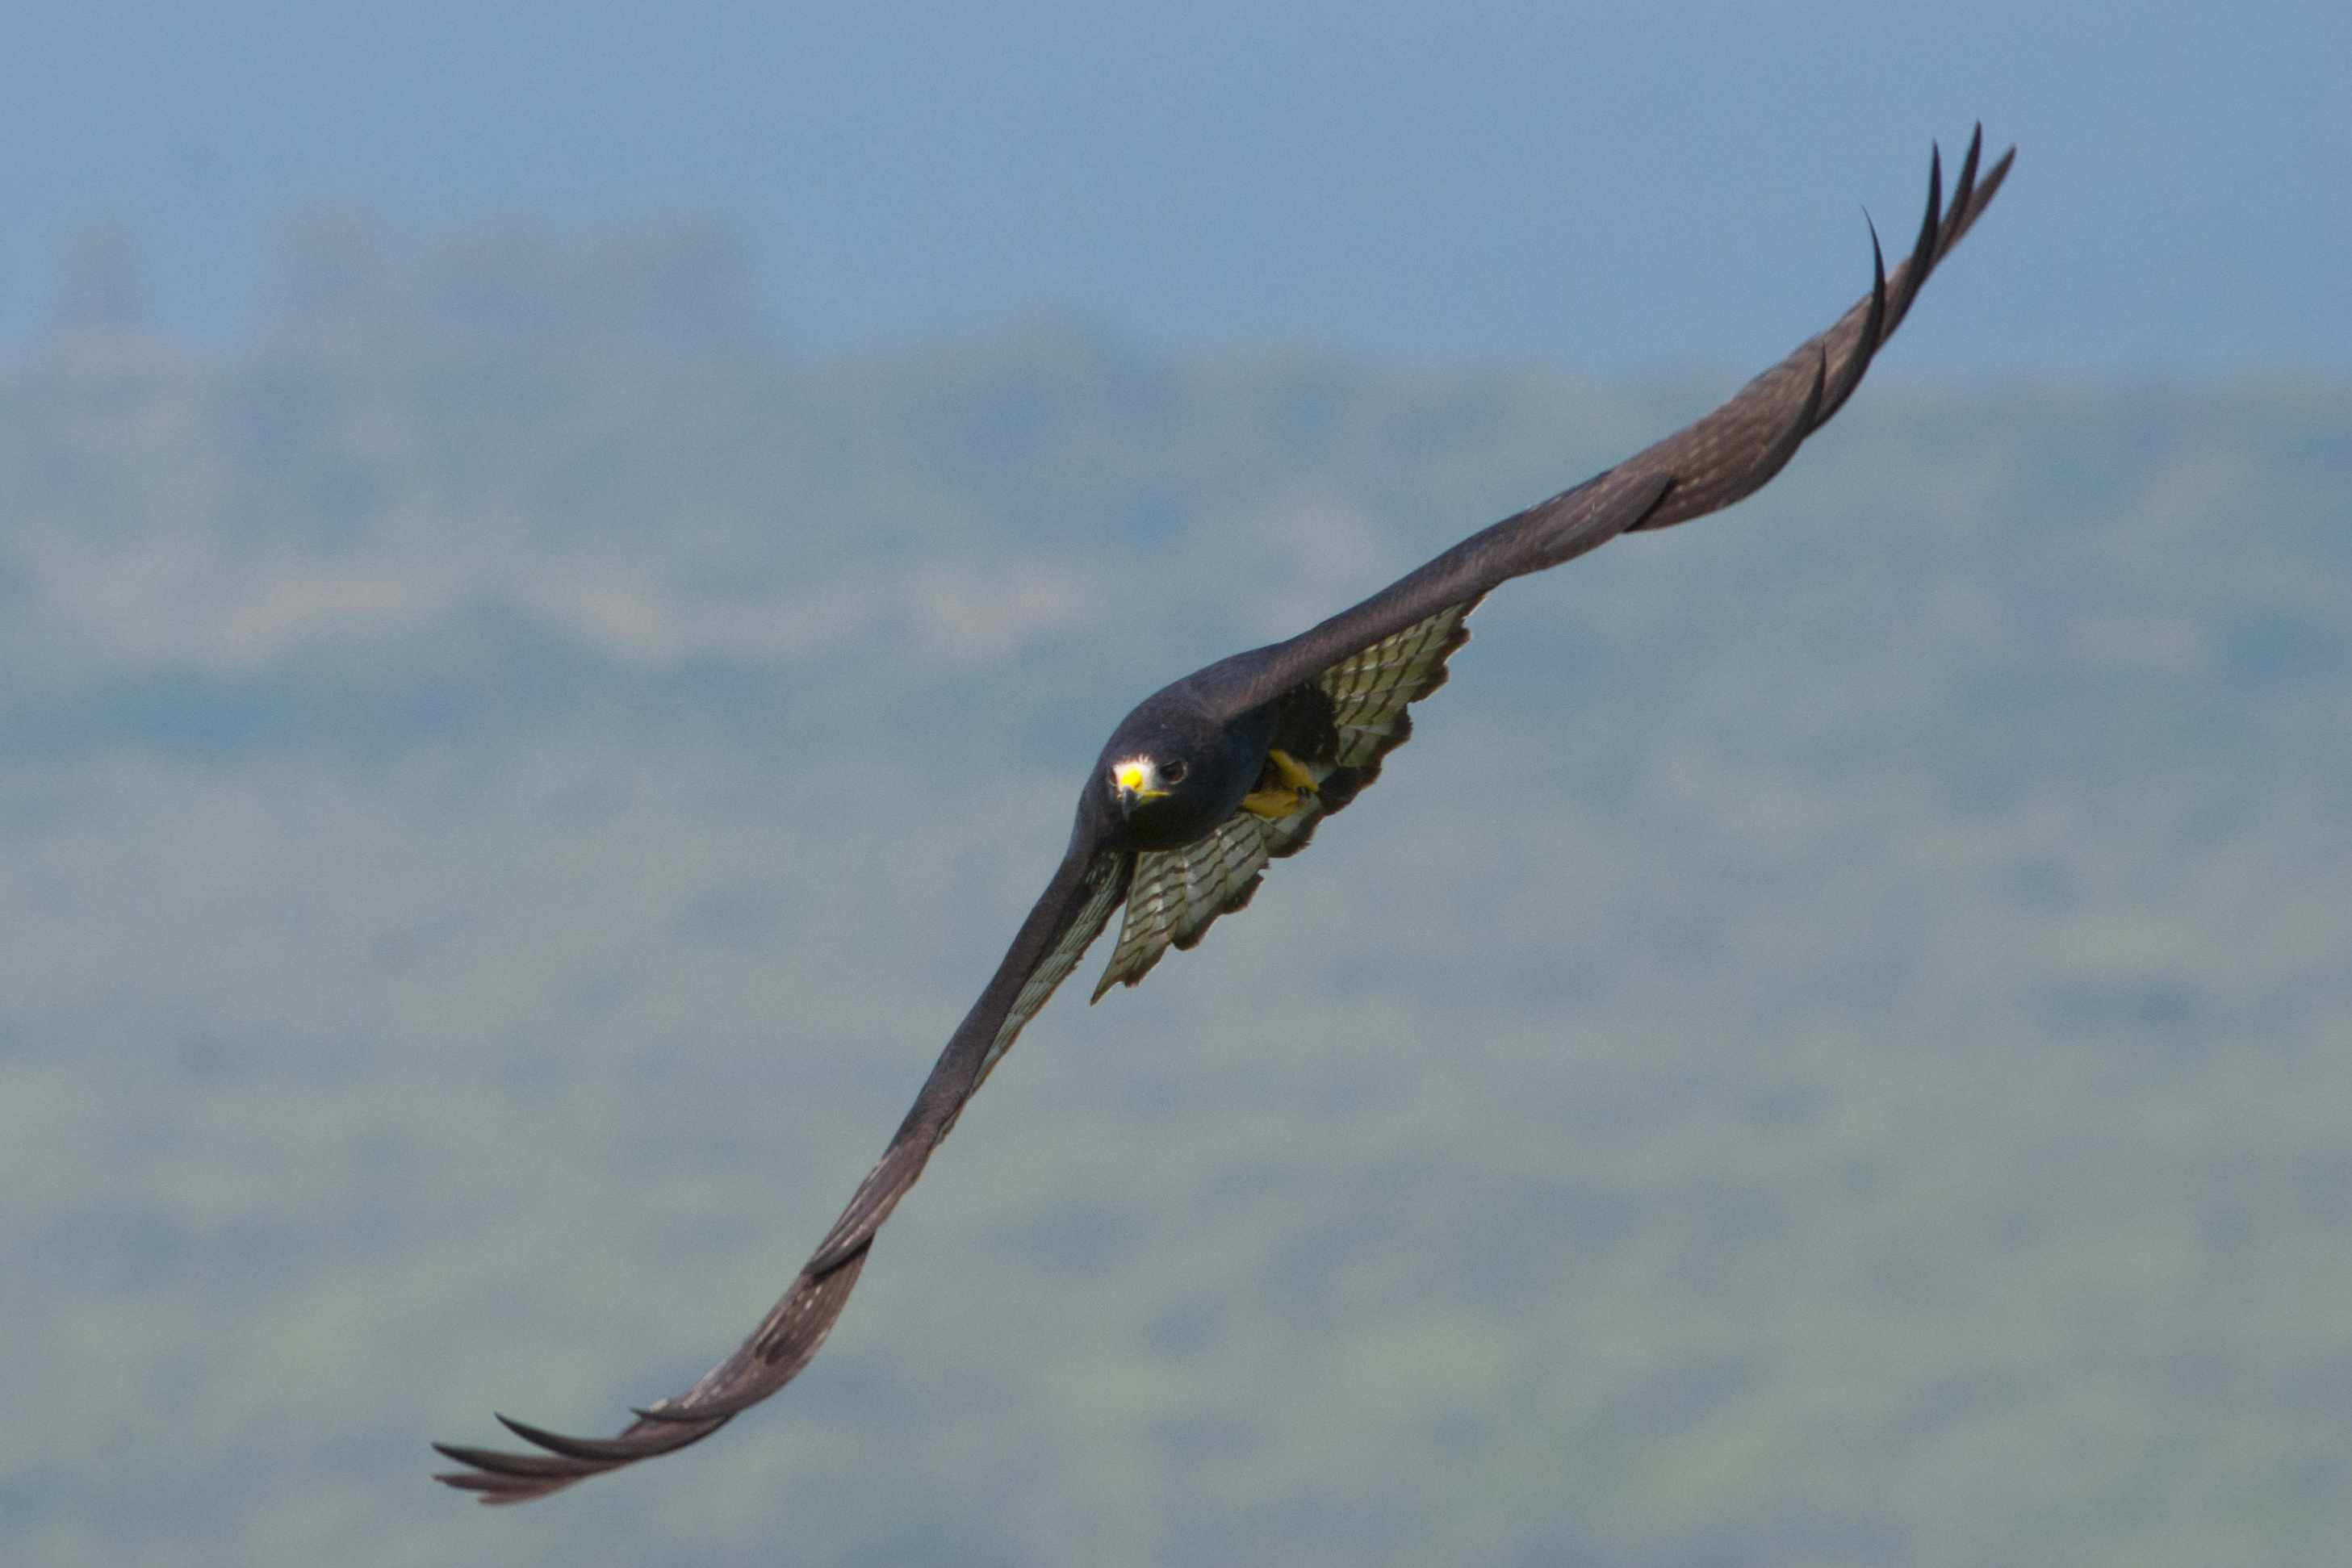 Zone - tailed Hawk, Buteo albonotatus